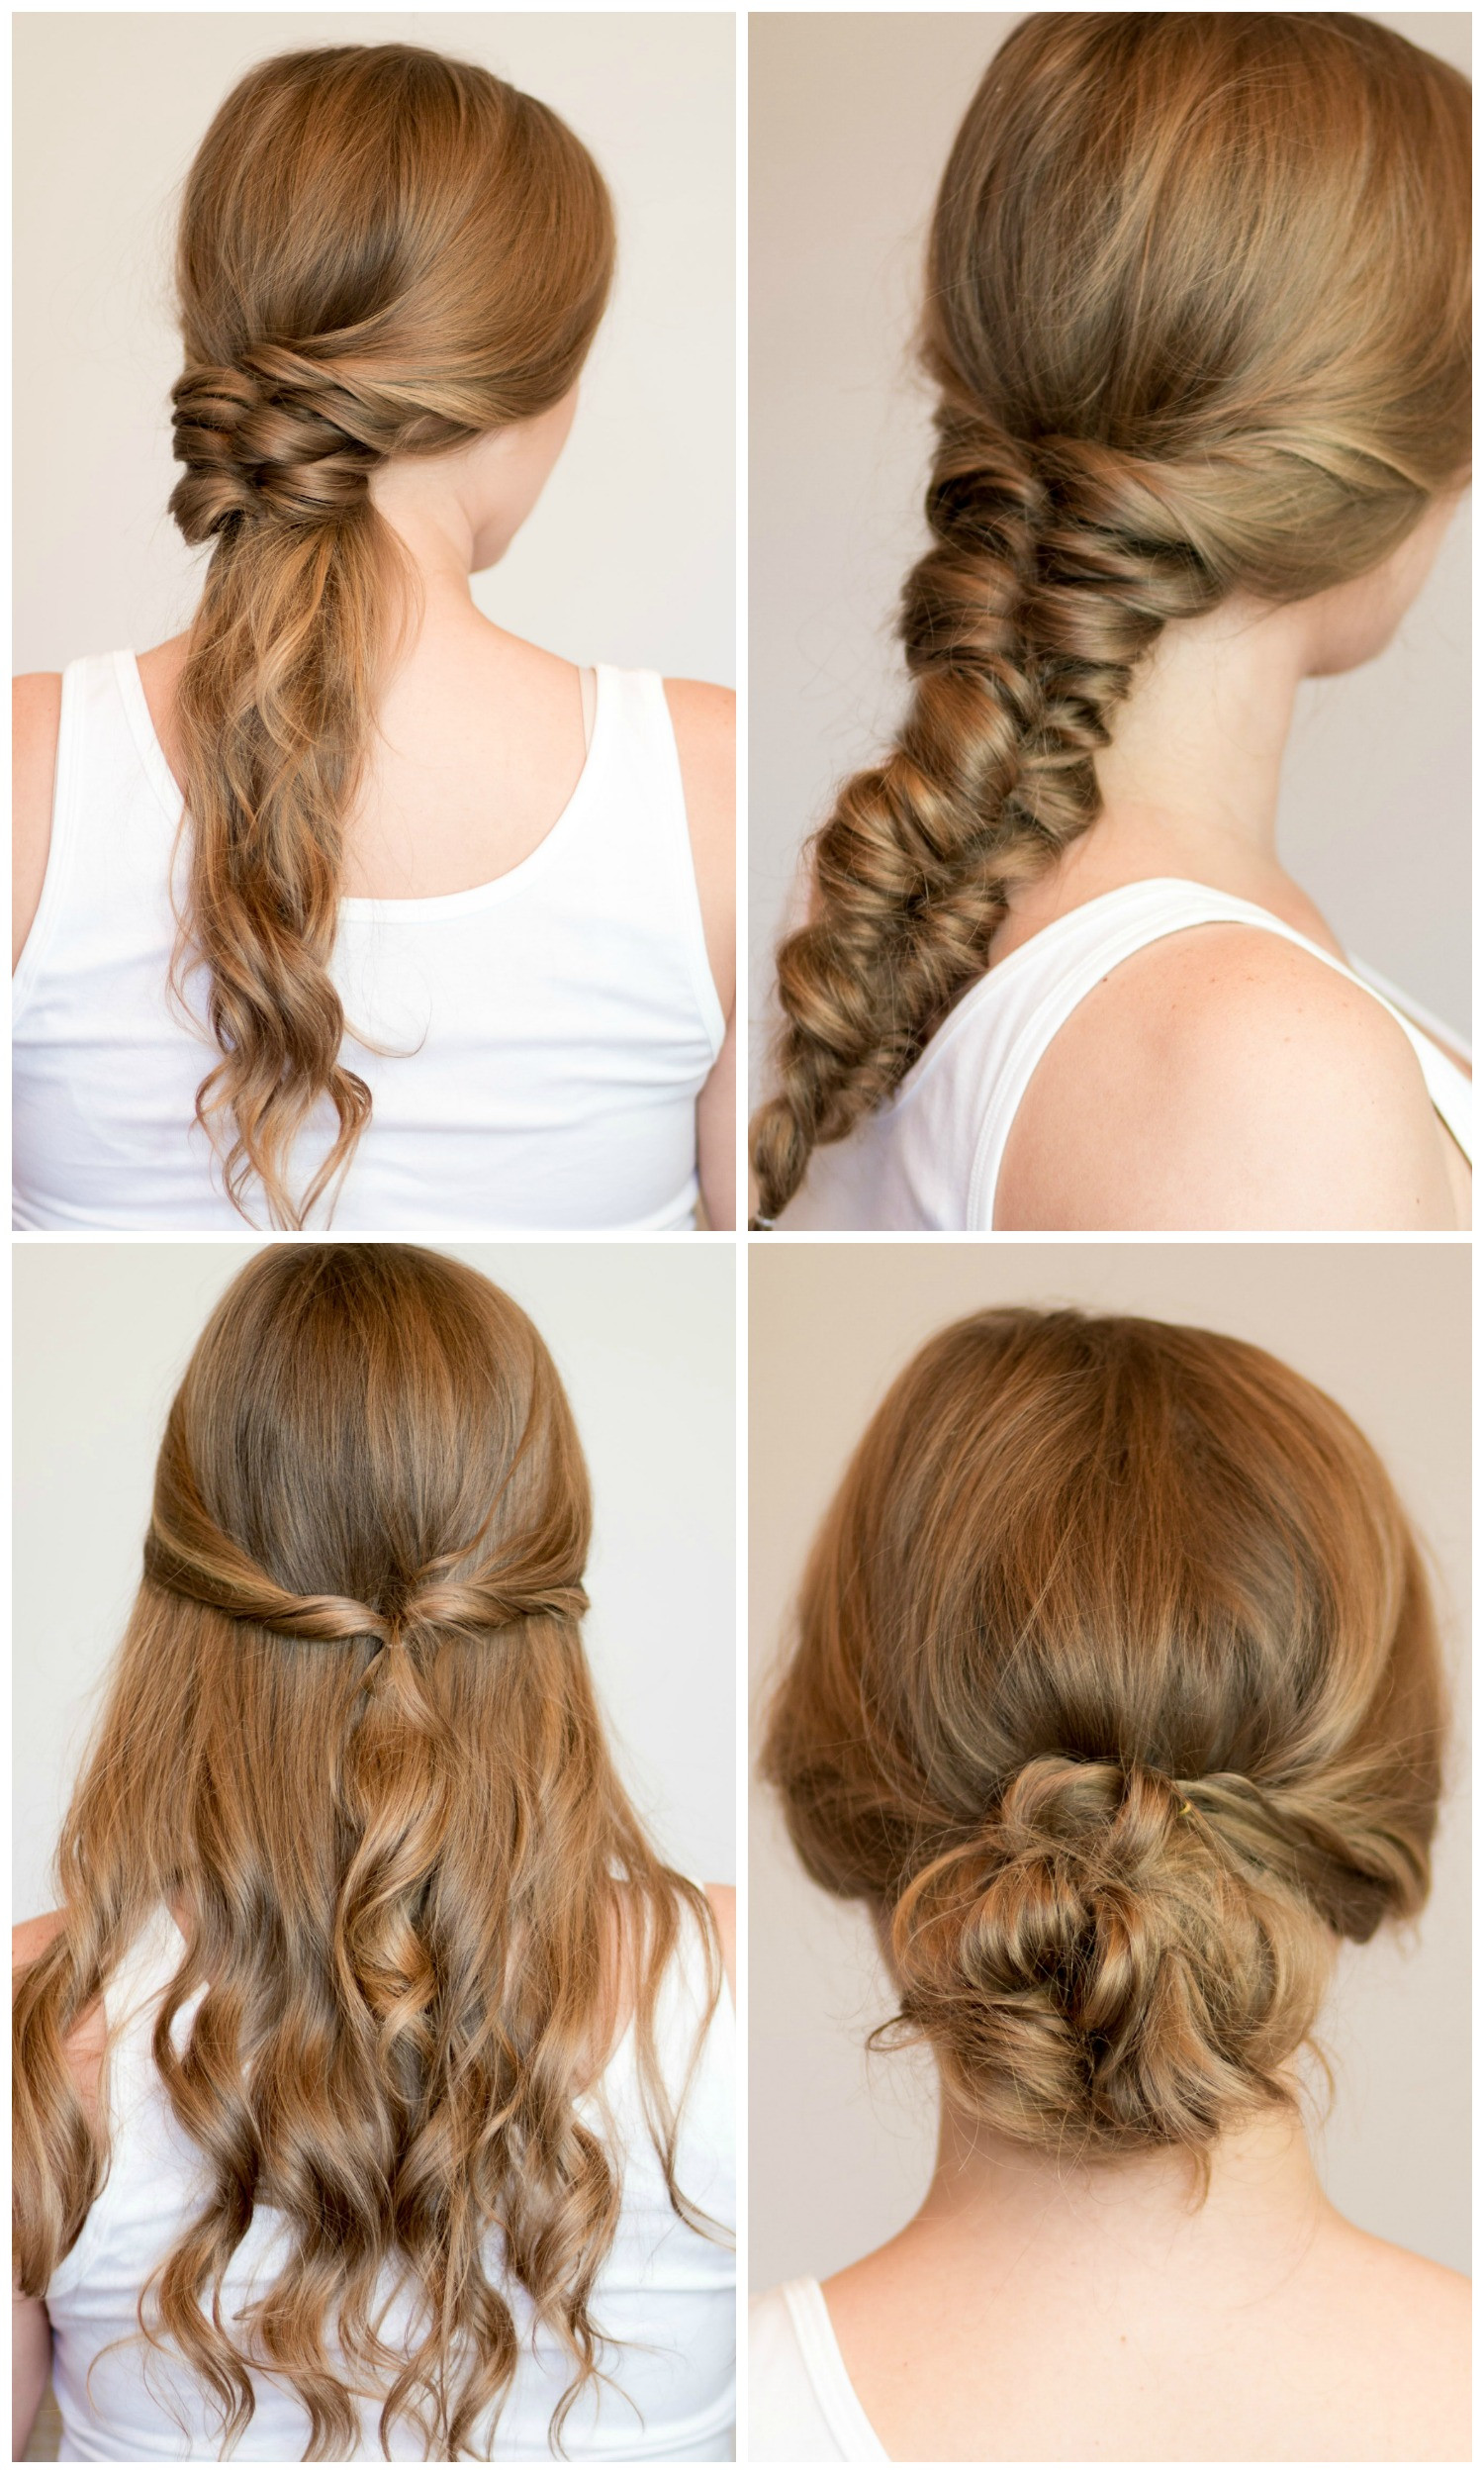 Easy Frisuren  Easy Heatless Hairstyles for Long Hair